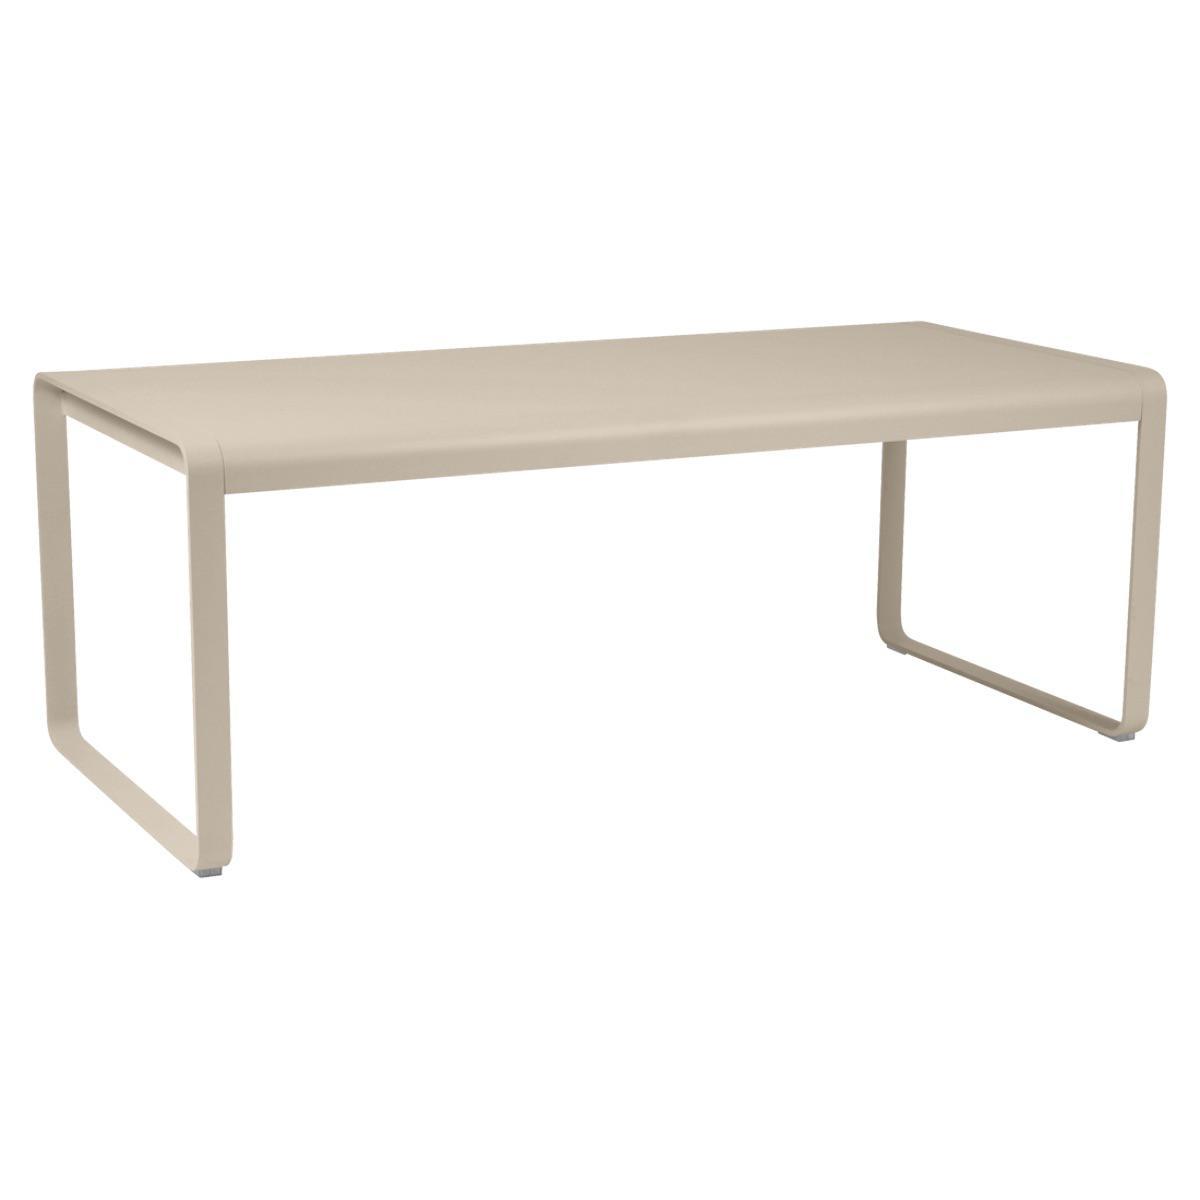 Table 90x196cm BELLEVIE PREMIUM Fermob brun muscade